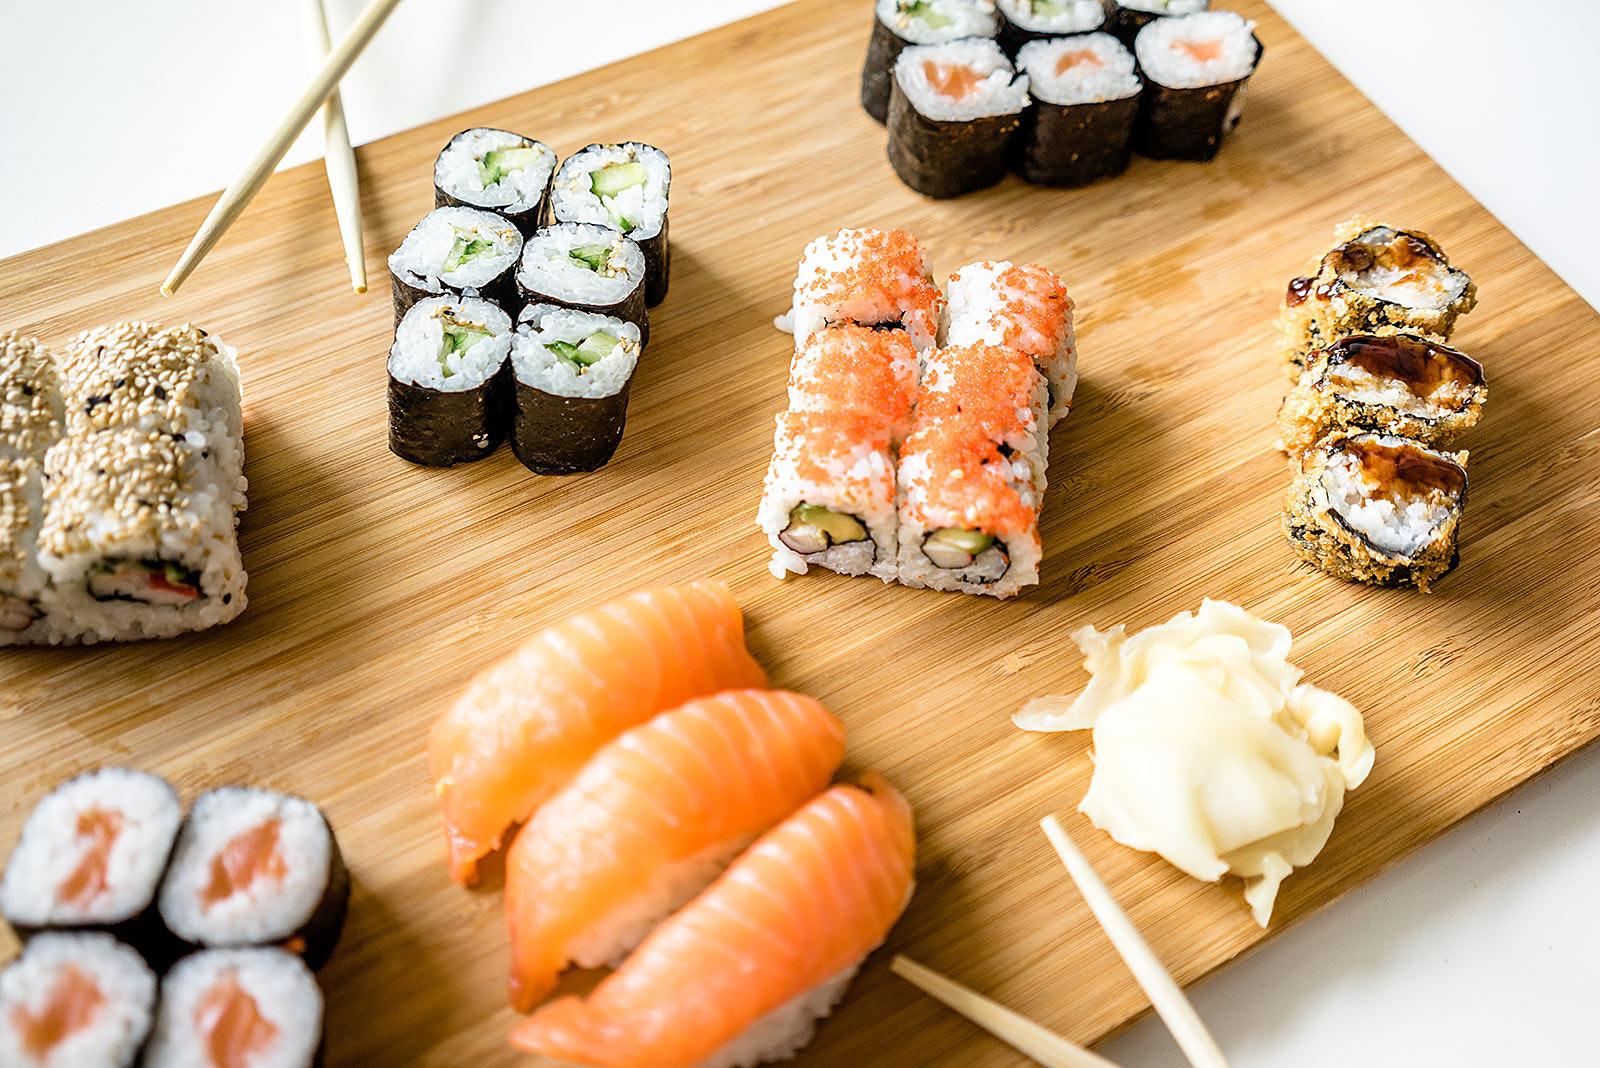 Wakaiido Düsseldorf foodora Lieferservice Sushi Restaurant Sunnyinga